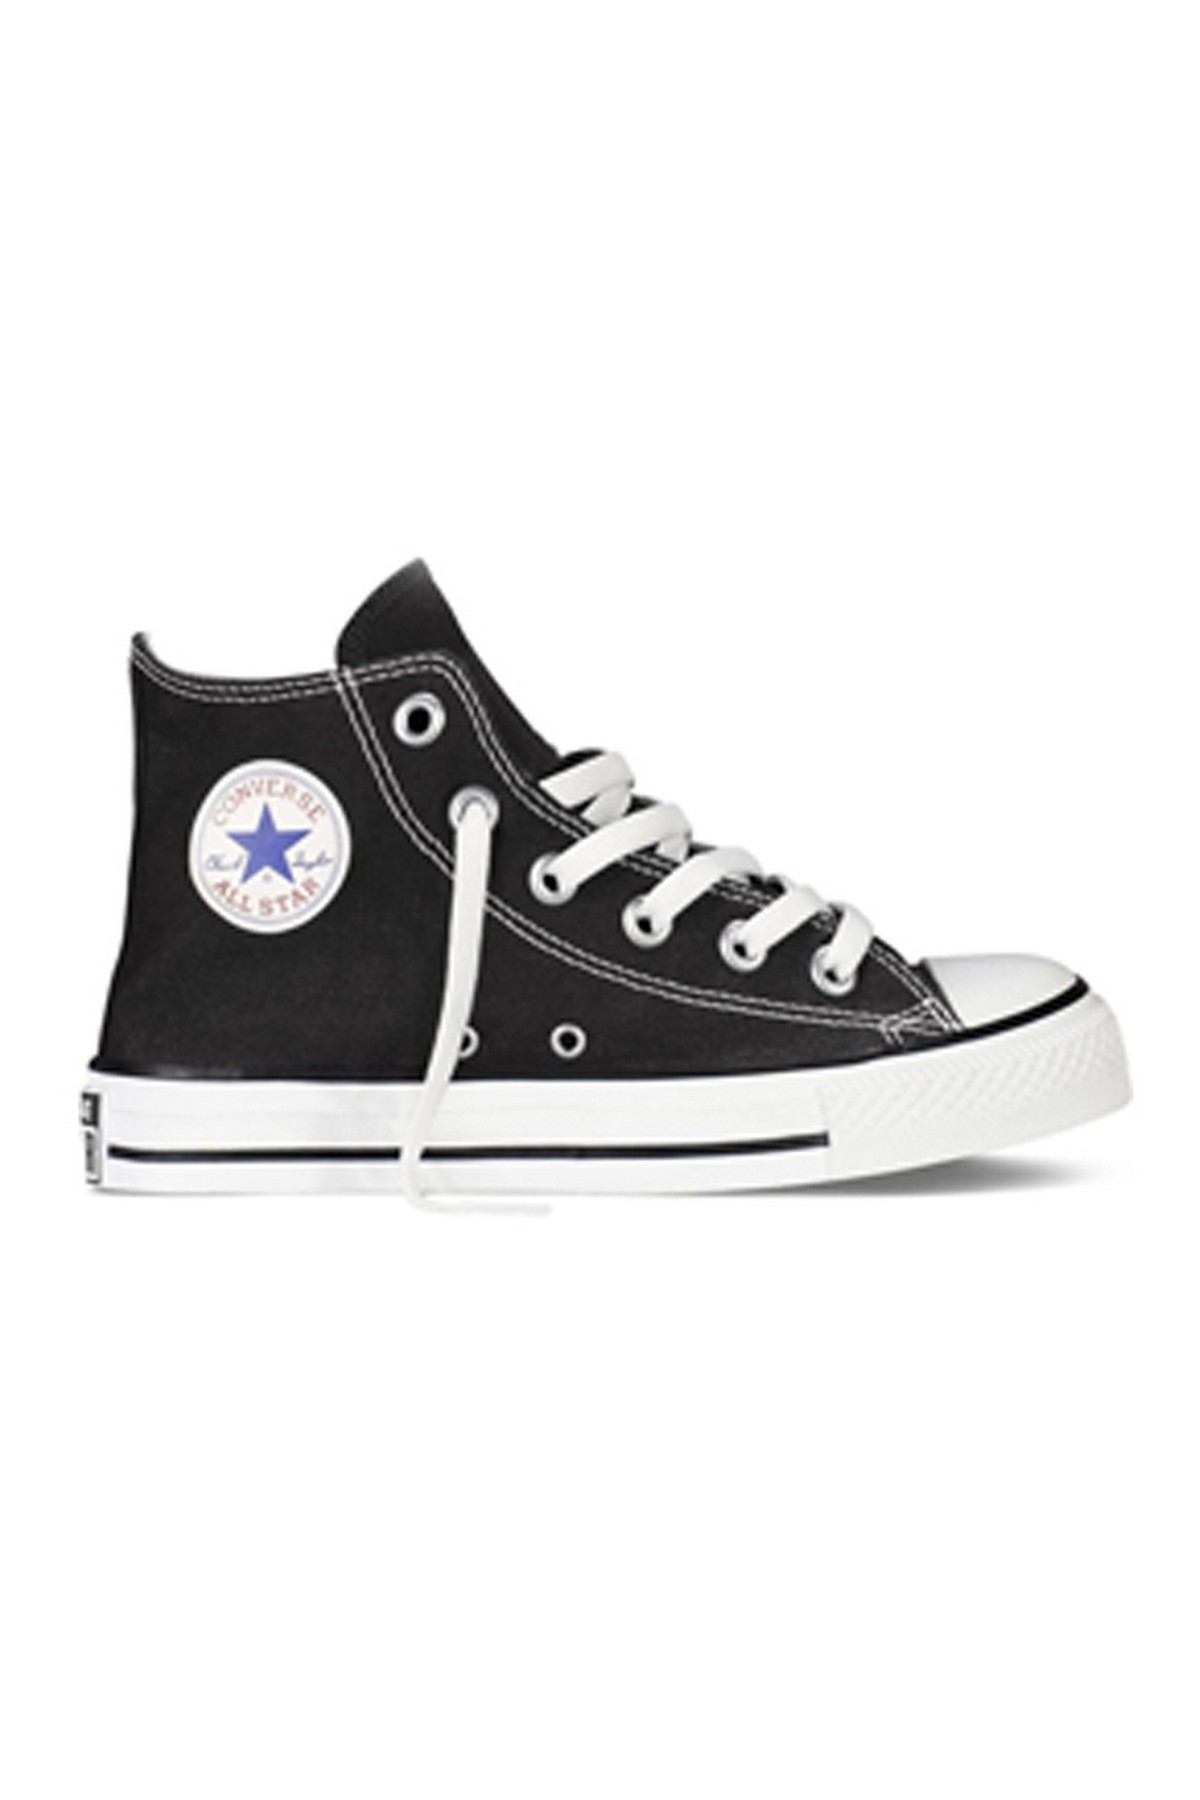 Converse Chuck Taylor All Star Çocuk Siyah Sneaker (3J231)